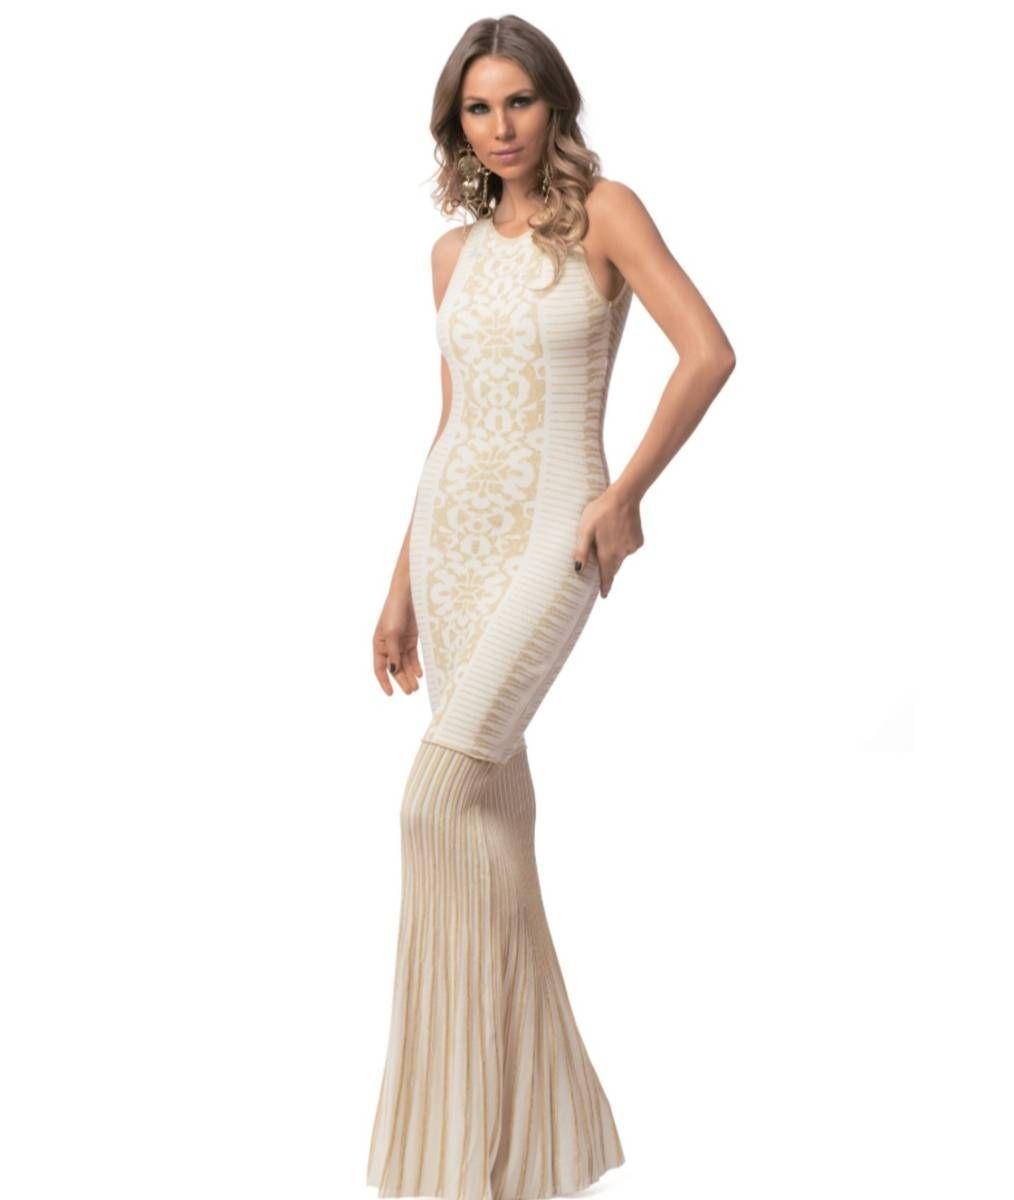 99a7261c1 vestido longo white fabulous agilita - vestidos agilita fabulous ...